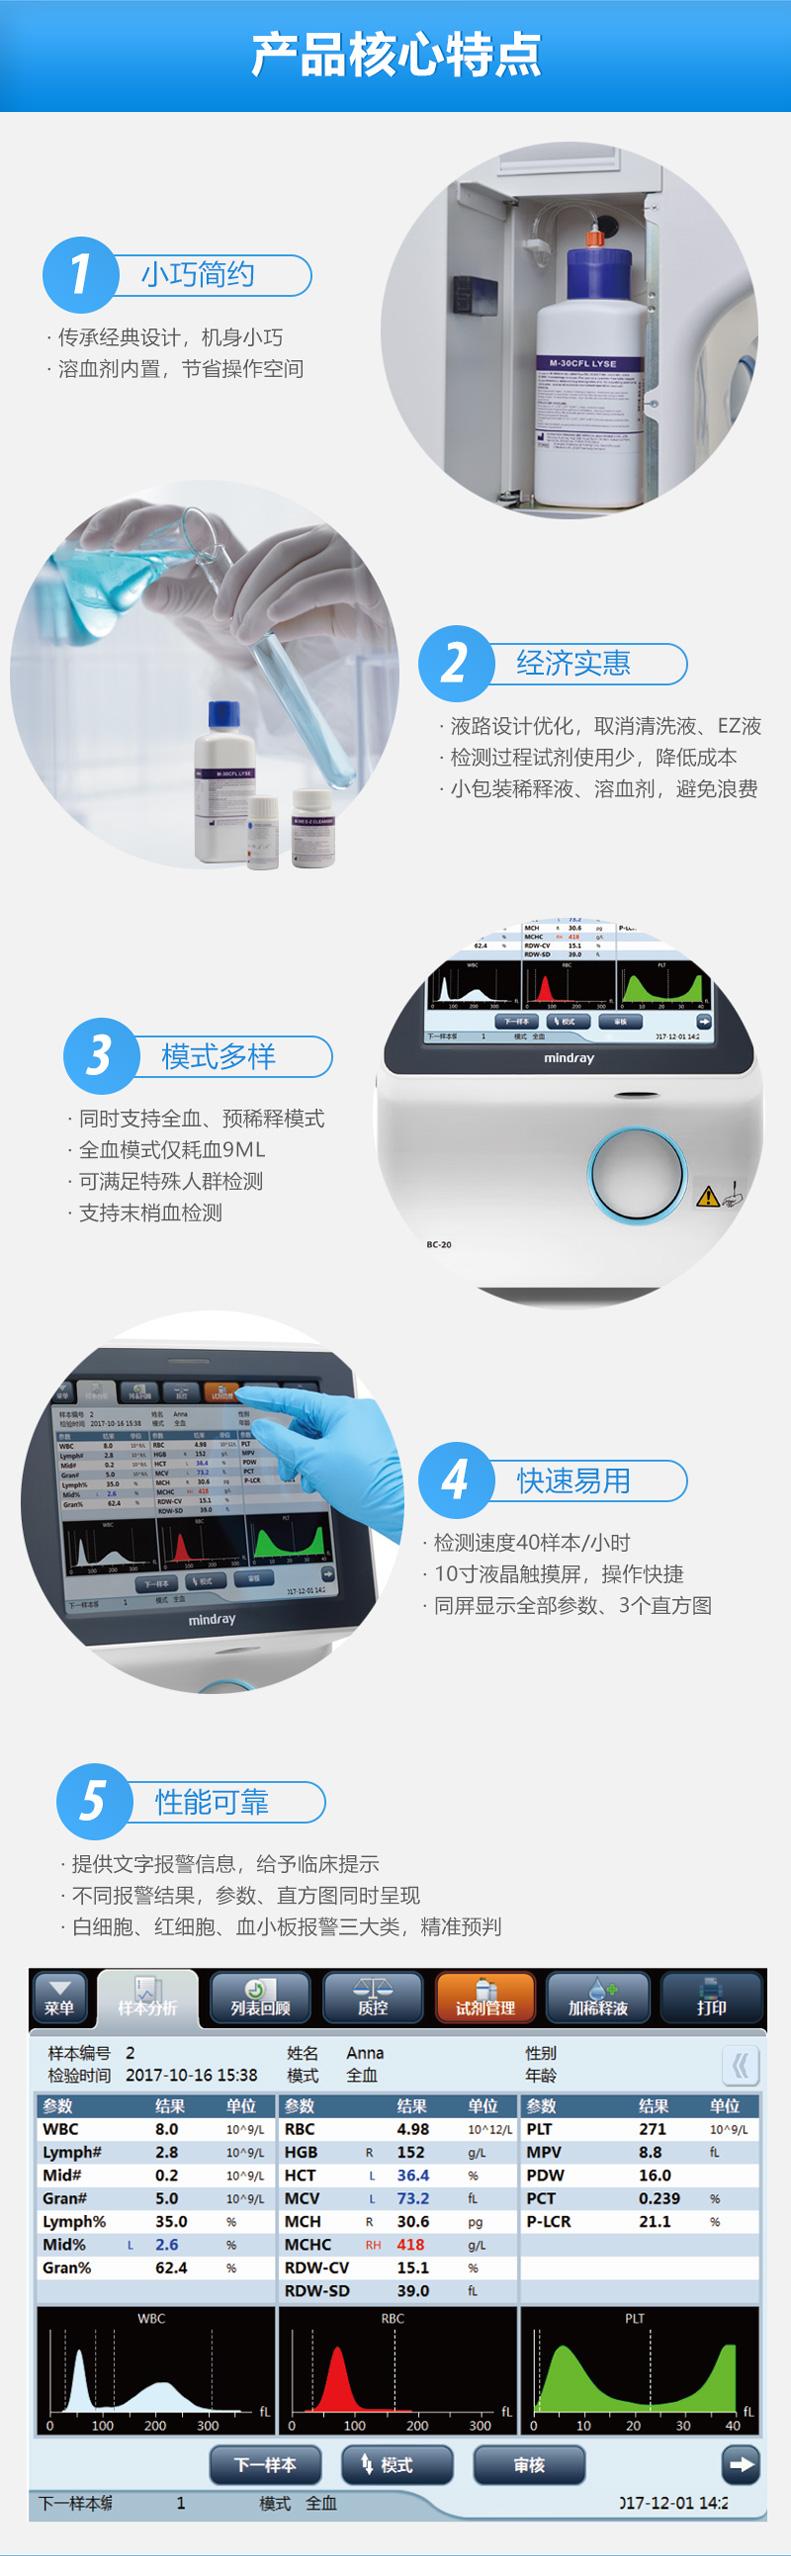 <strong>迈瑞全自动三分类血液分析仪</strong>小巧简约 经济适用